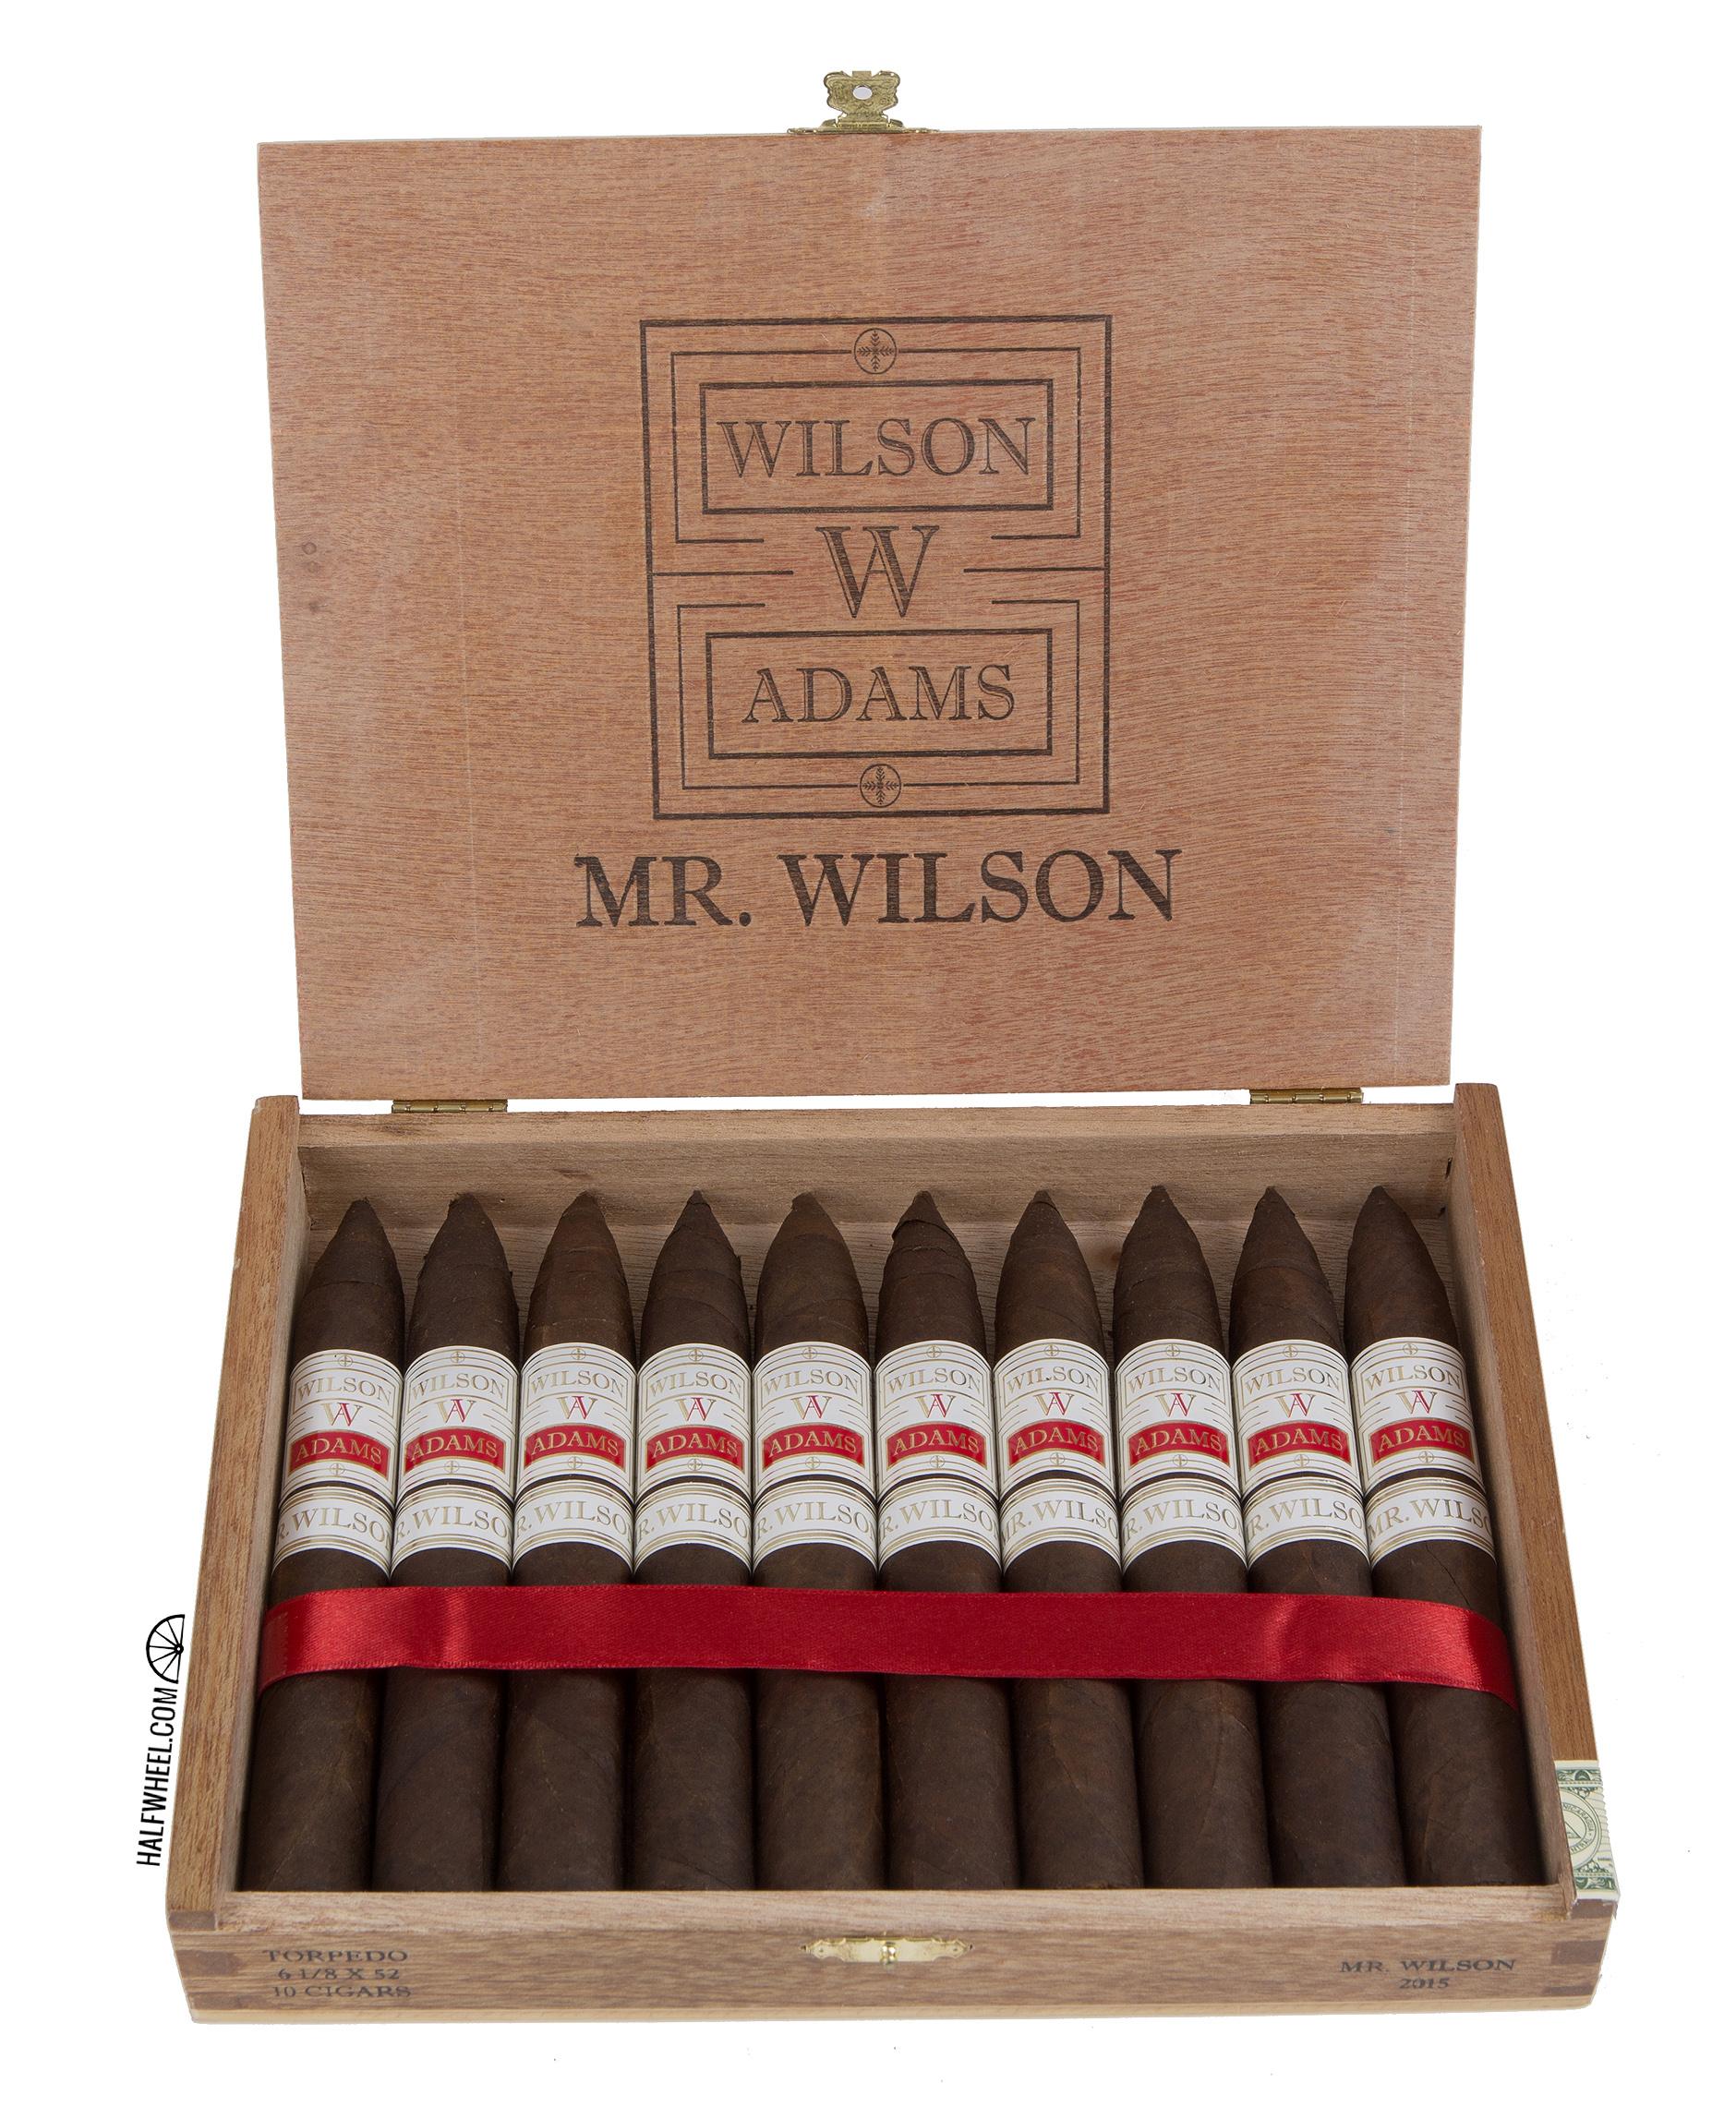 Wilson Adams Mr. Wilson Box 3